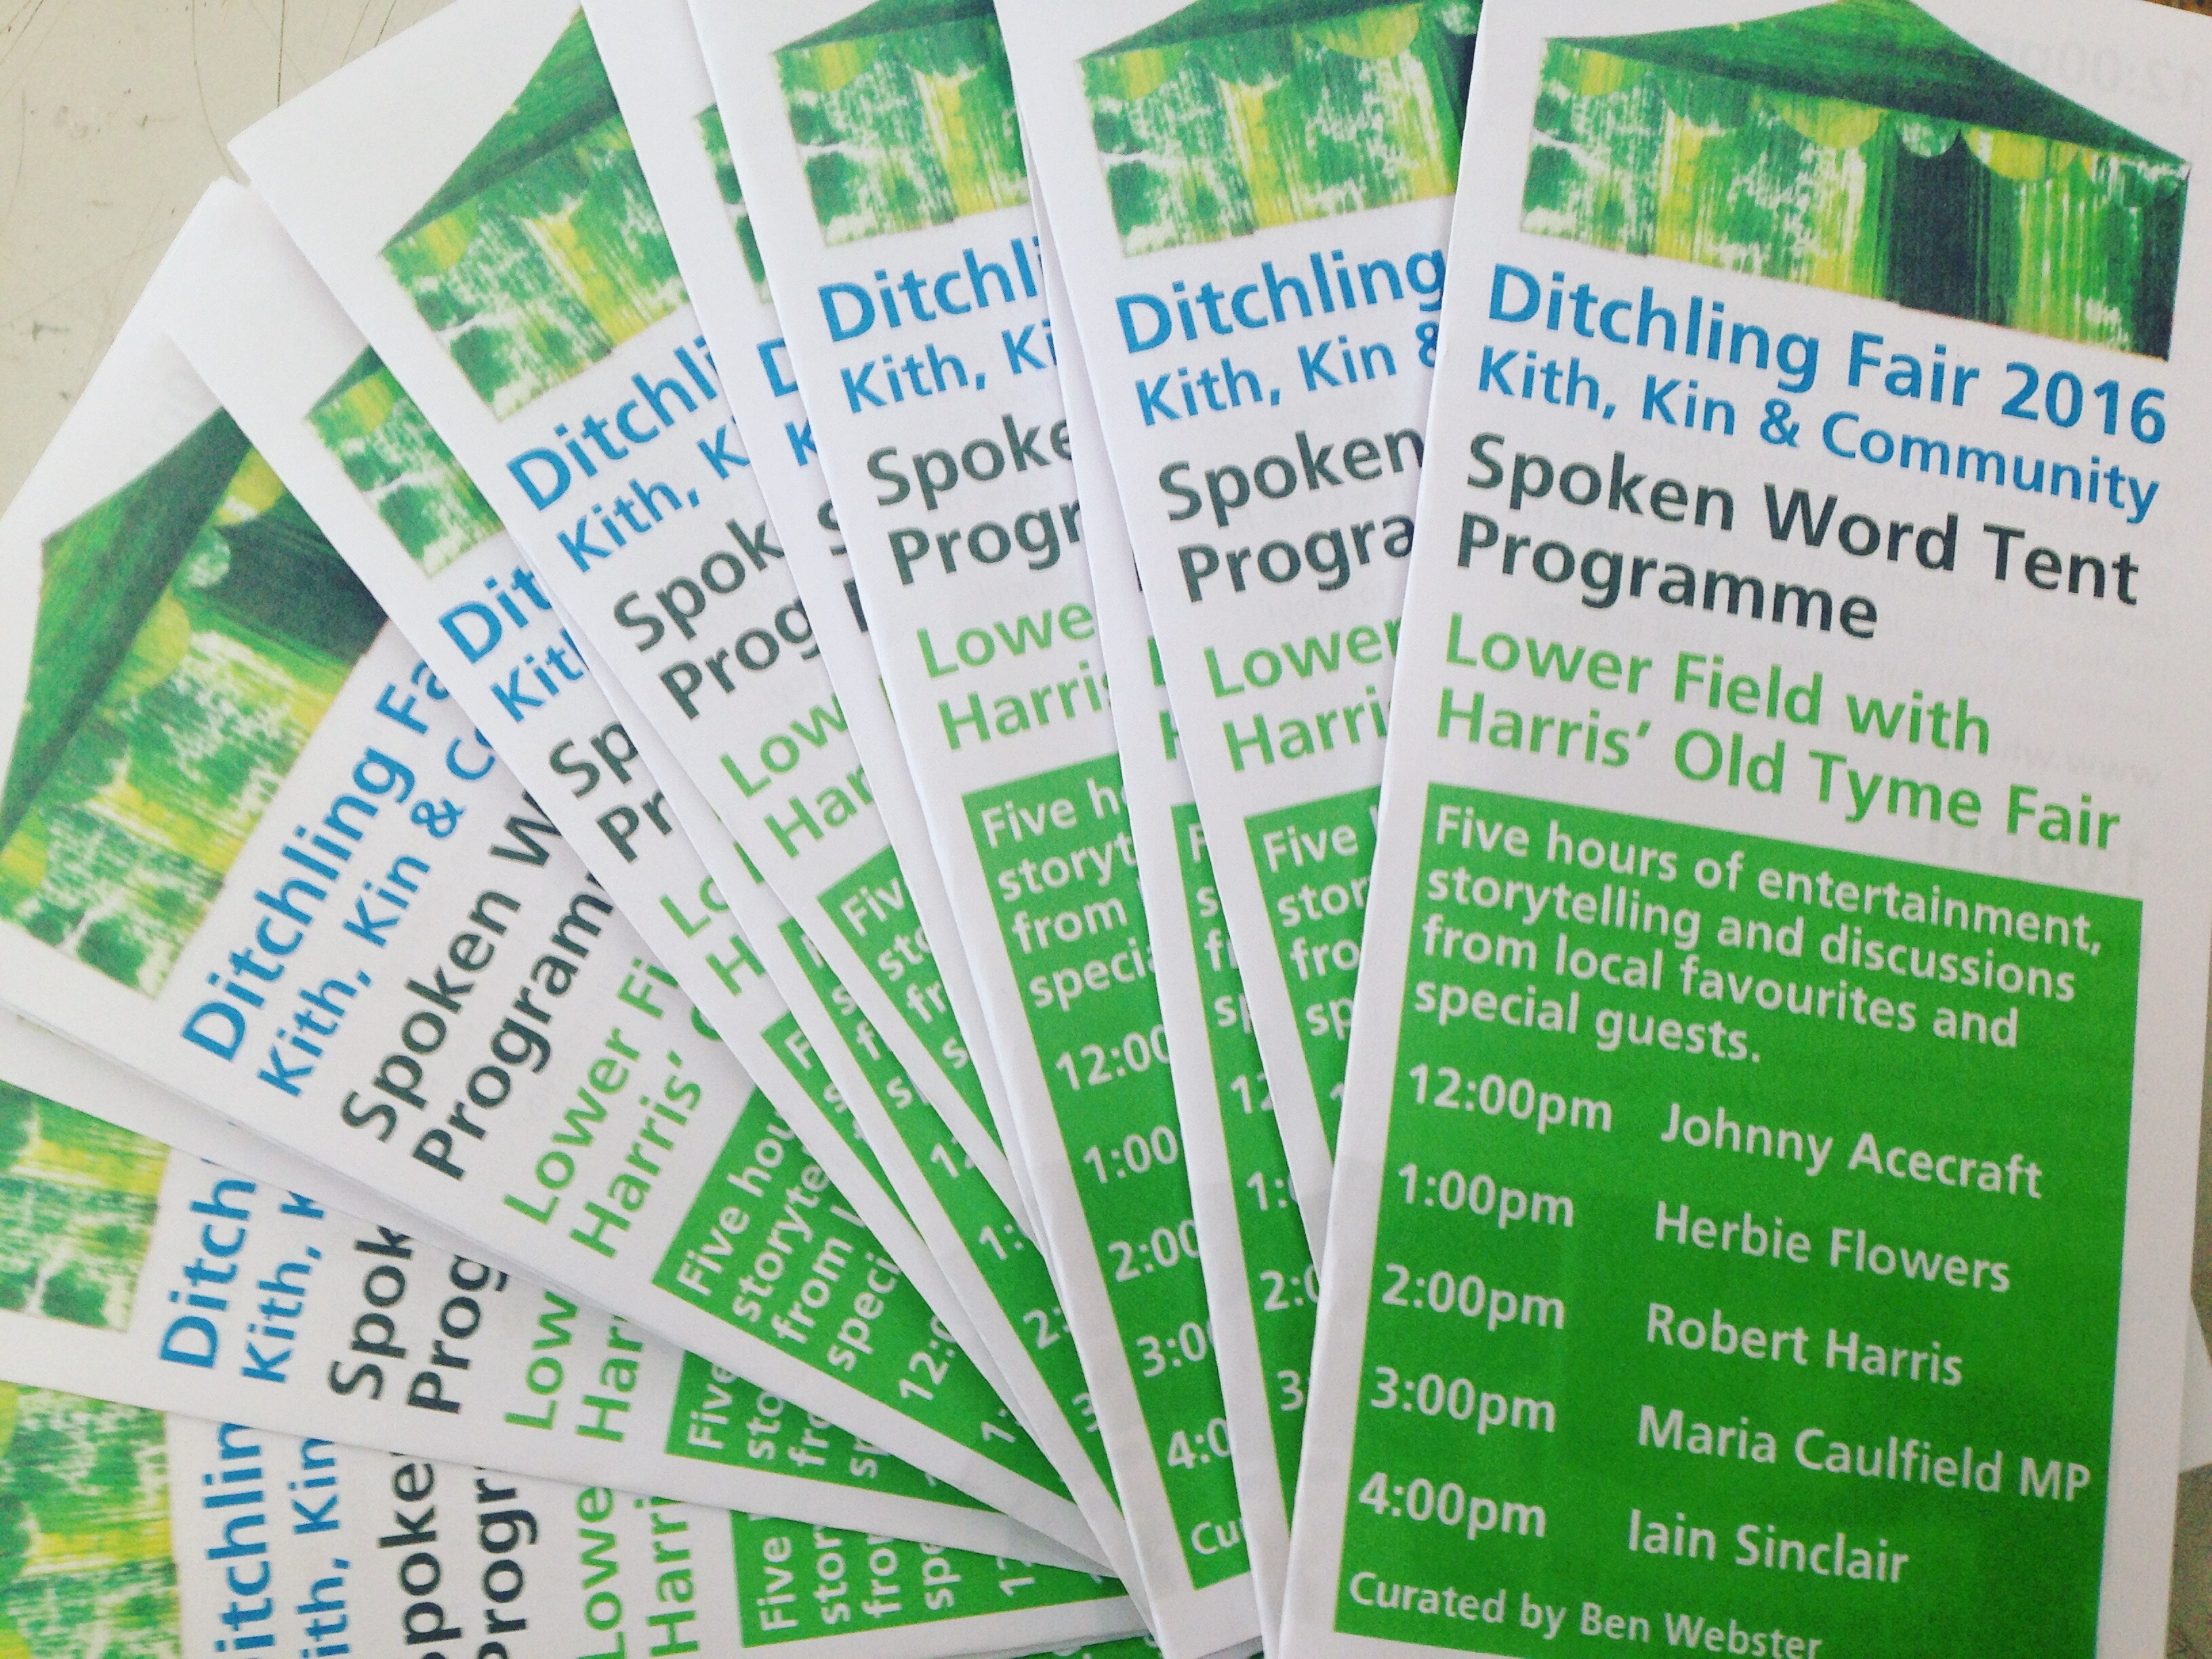 Spoken Word Tent Programme